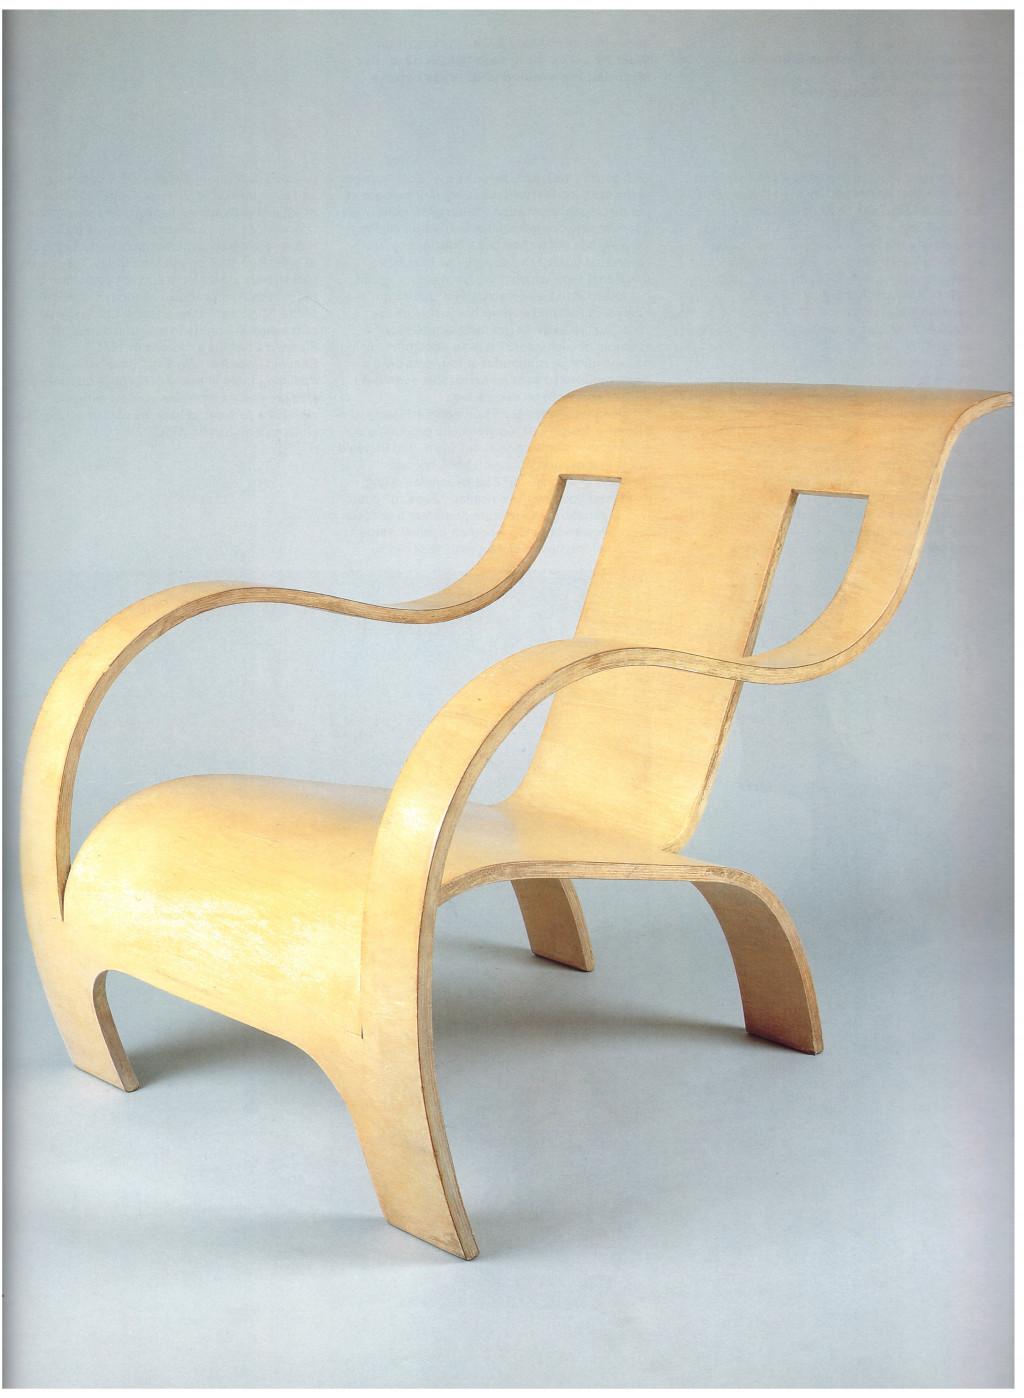 Fig. 14. Gerald Summers, 'Plywood armchair', 1933-1934. Bron: Vegesack 1996, p.110, cat.nr. 42